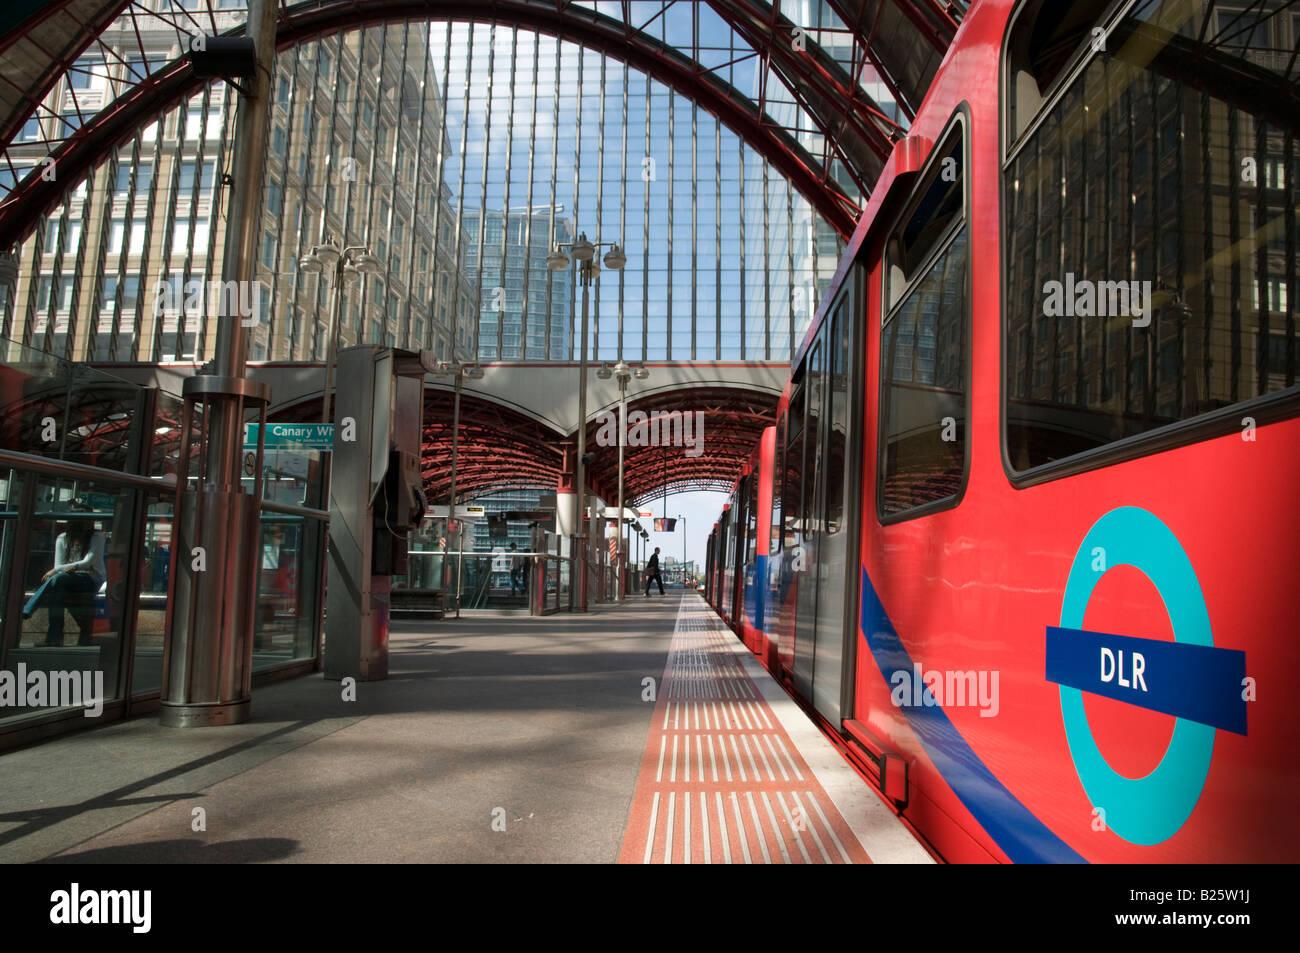 Canary Wharf Docklands Light Railway station, London UK - Stock Image